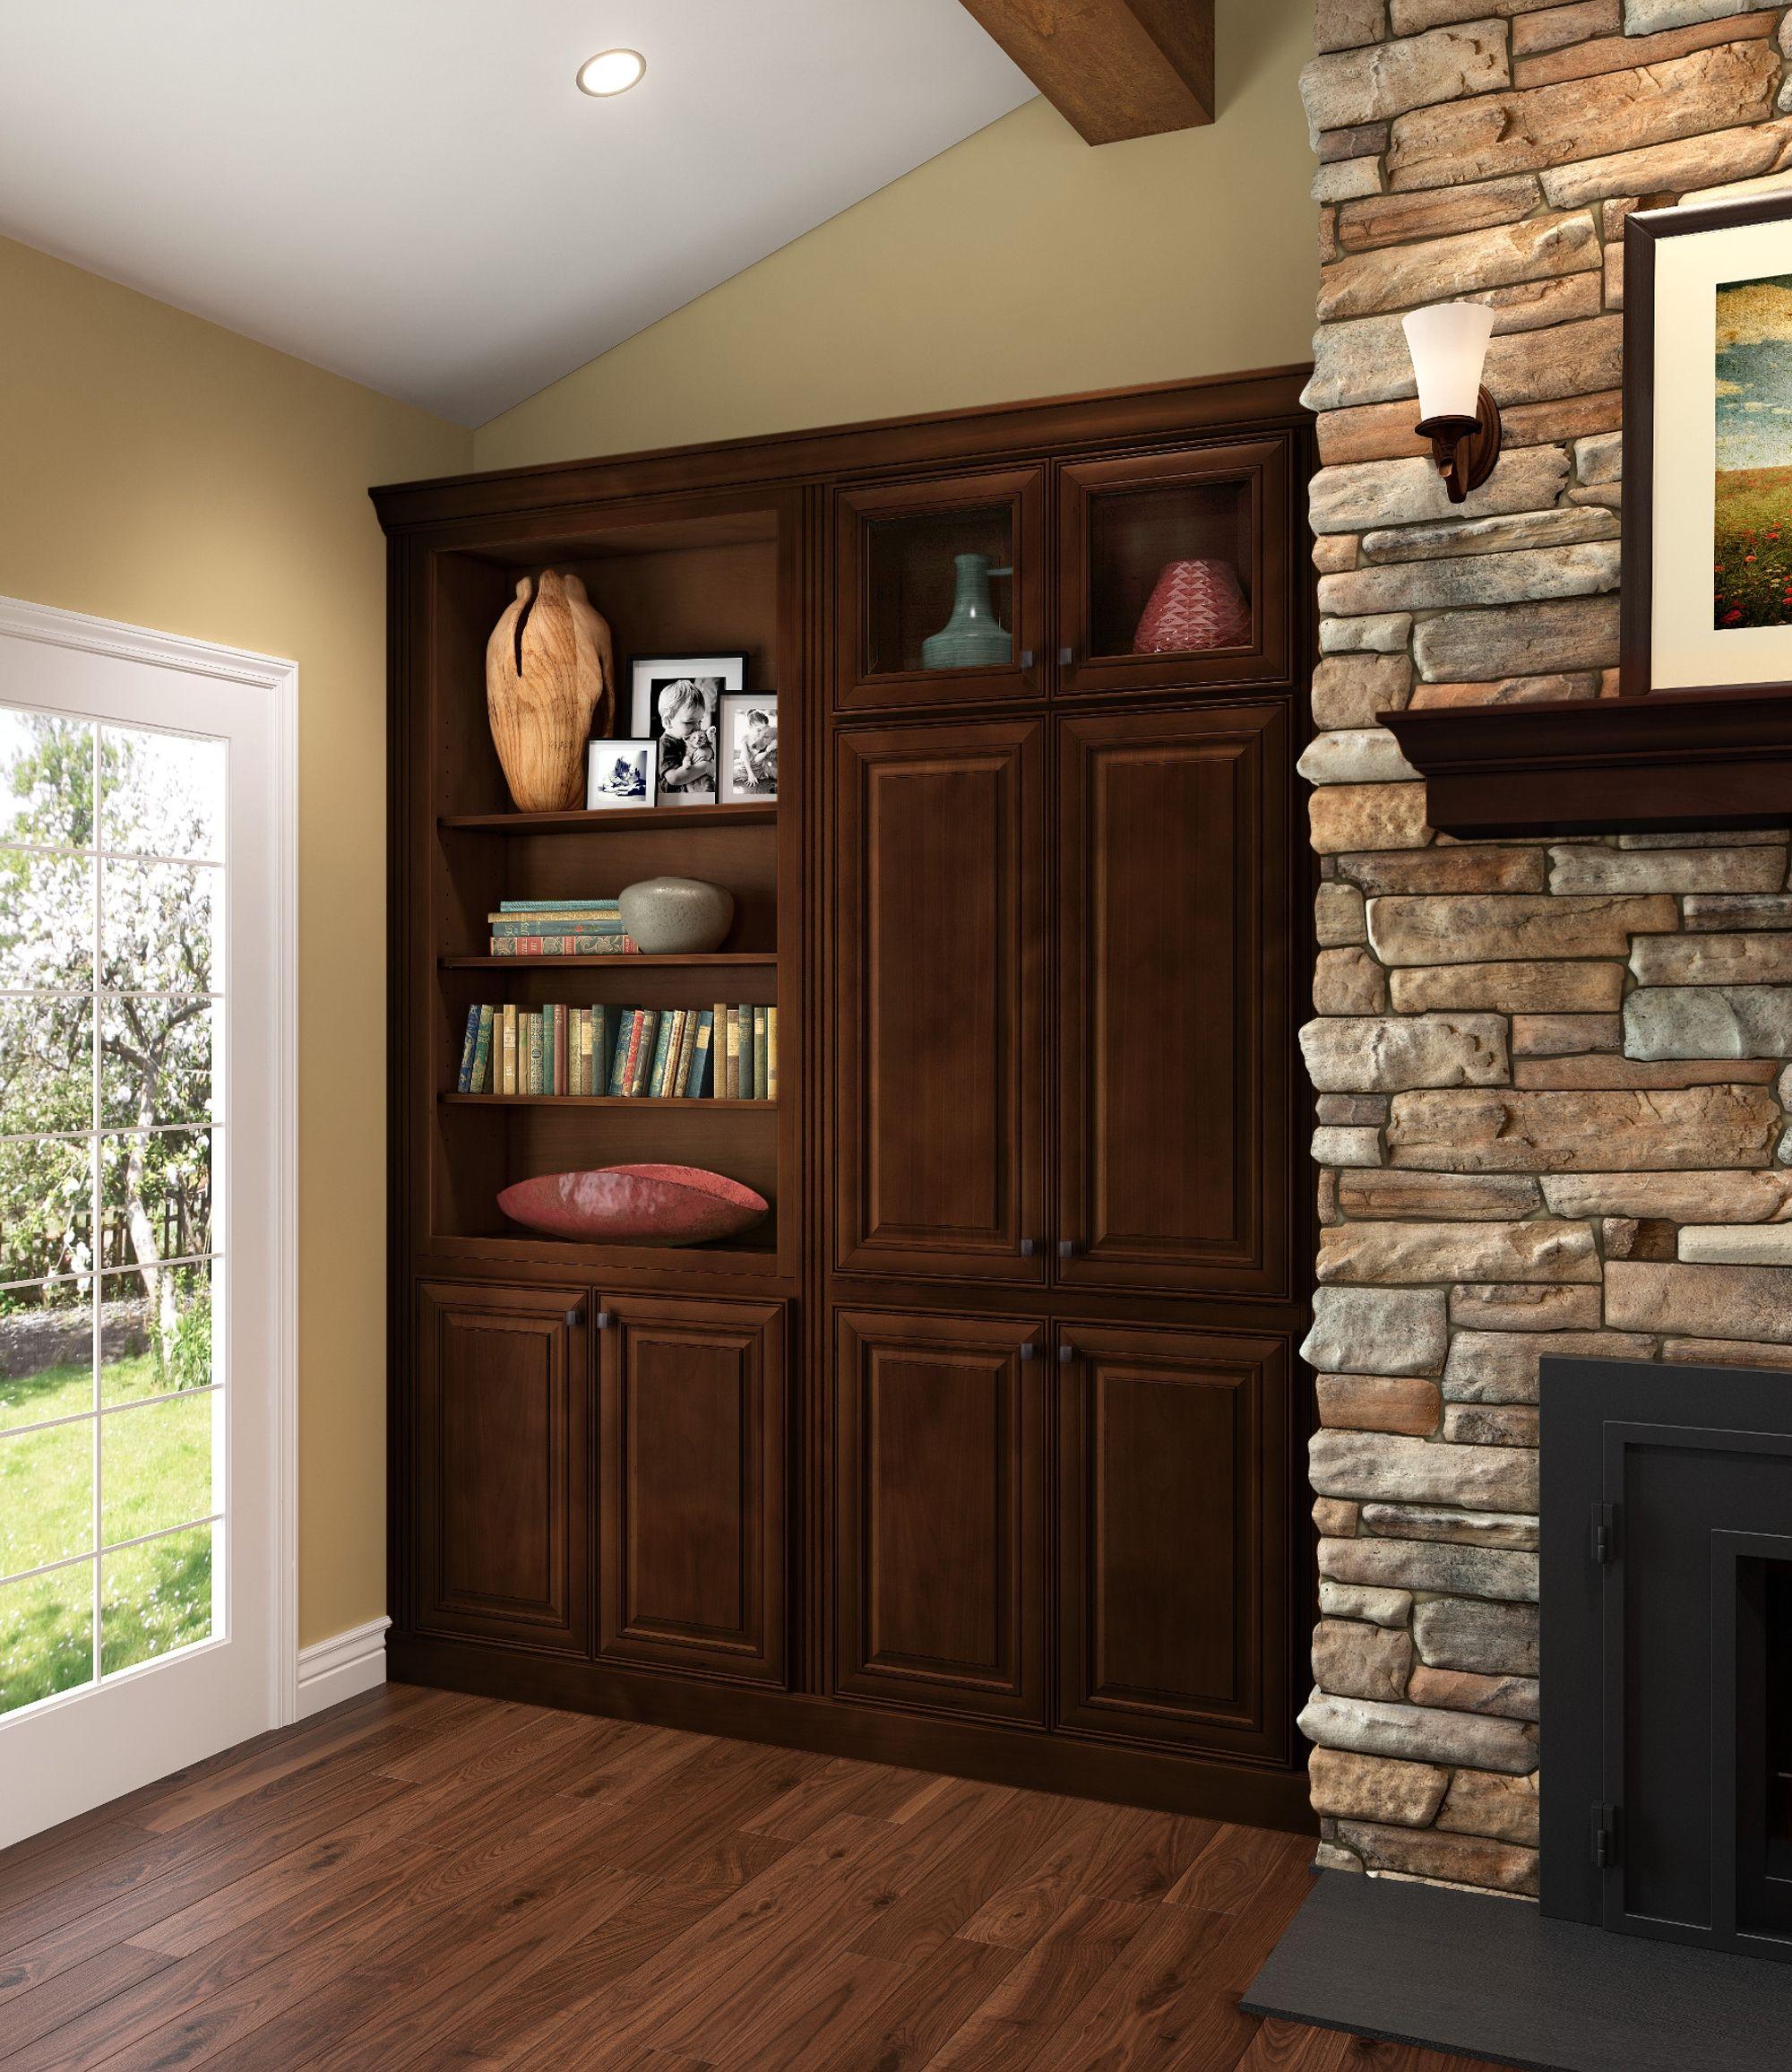 Shenandoah Cabinets - McKinley   Maple kitchen cabinets ...